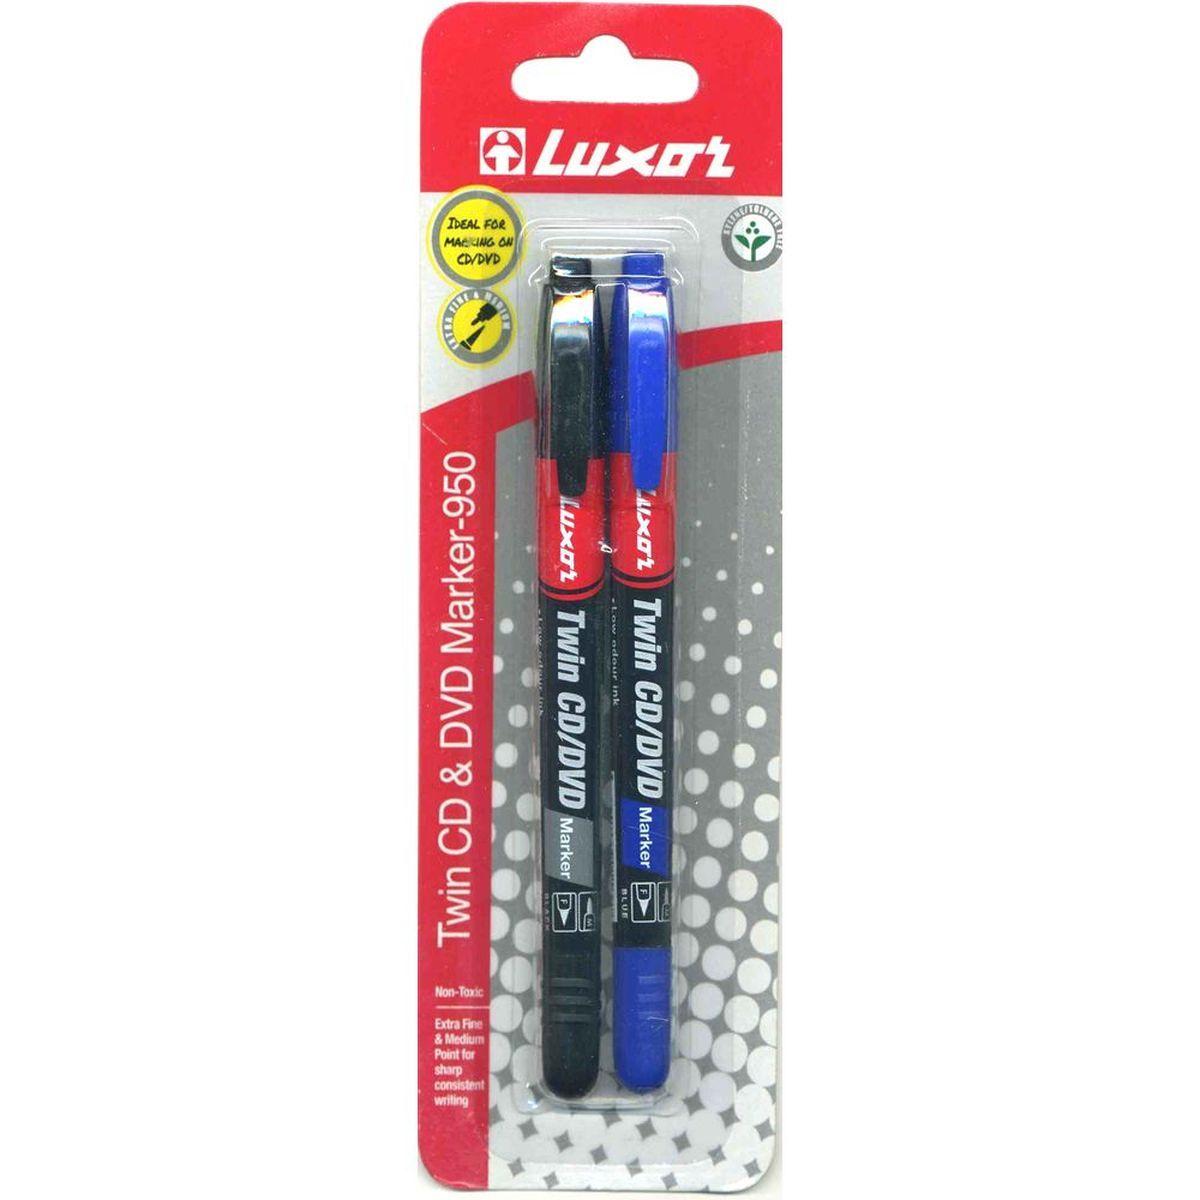 Luxor Набор двусторонних маркеров Twin для CD/DVD цвет черный синий 2 шт